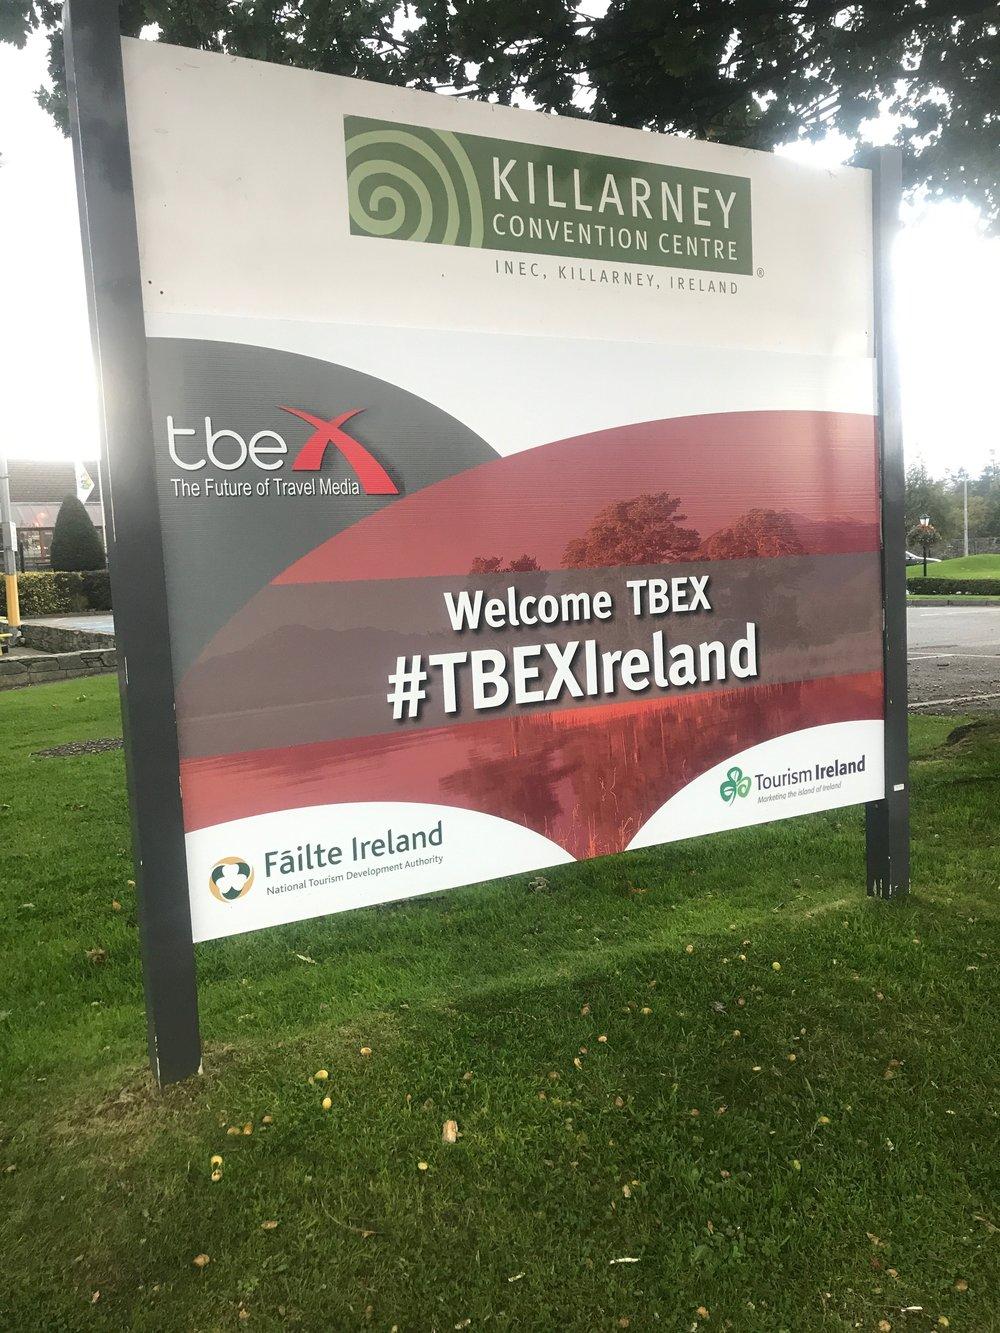 TBEX Ireland